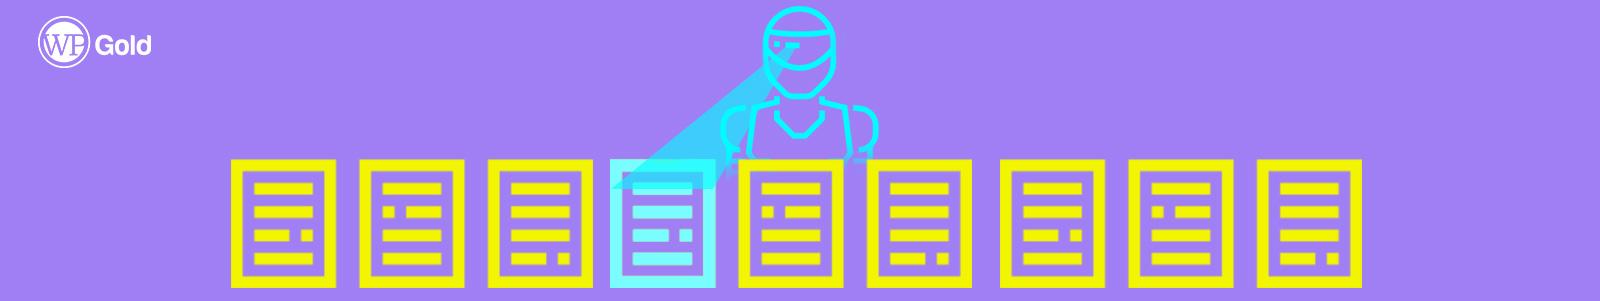 Работа с файлом robots.txt на WordPress-сайте